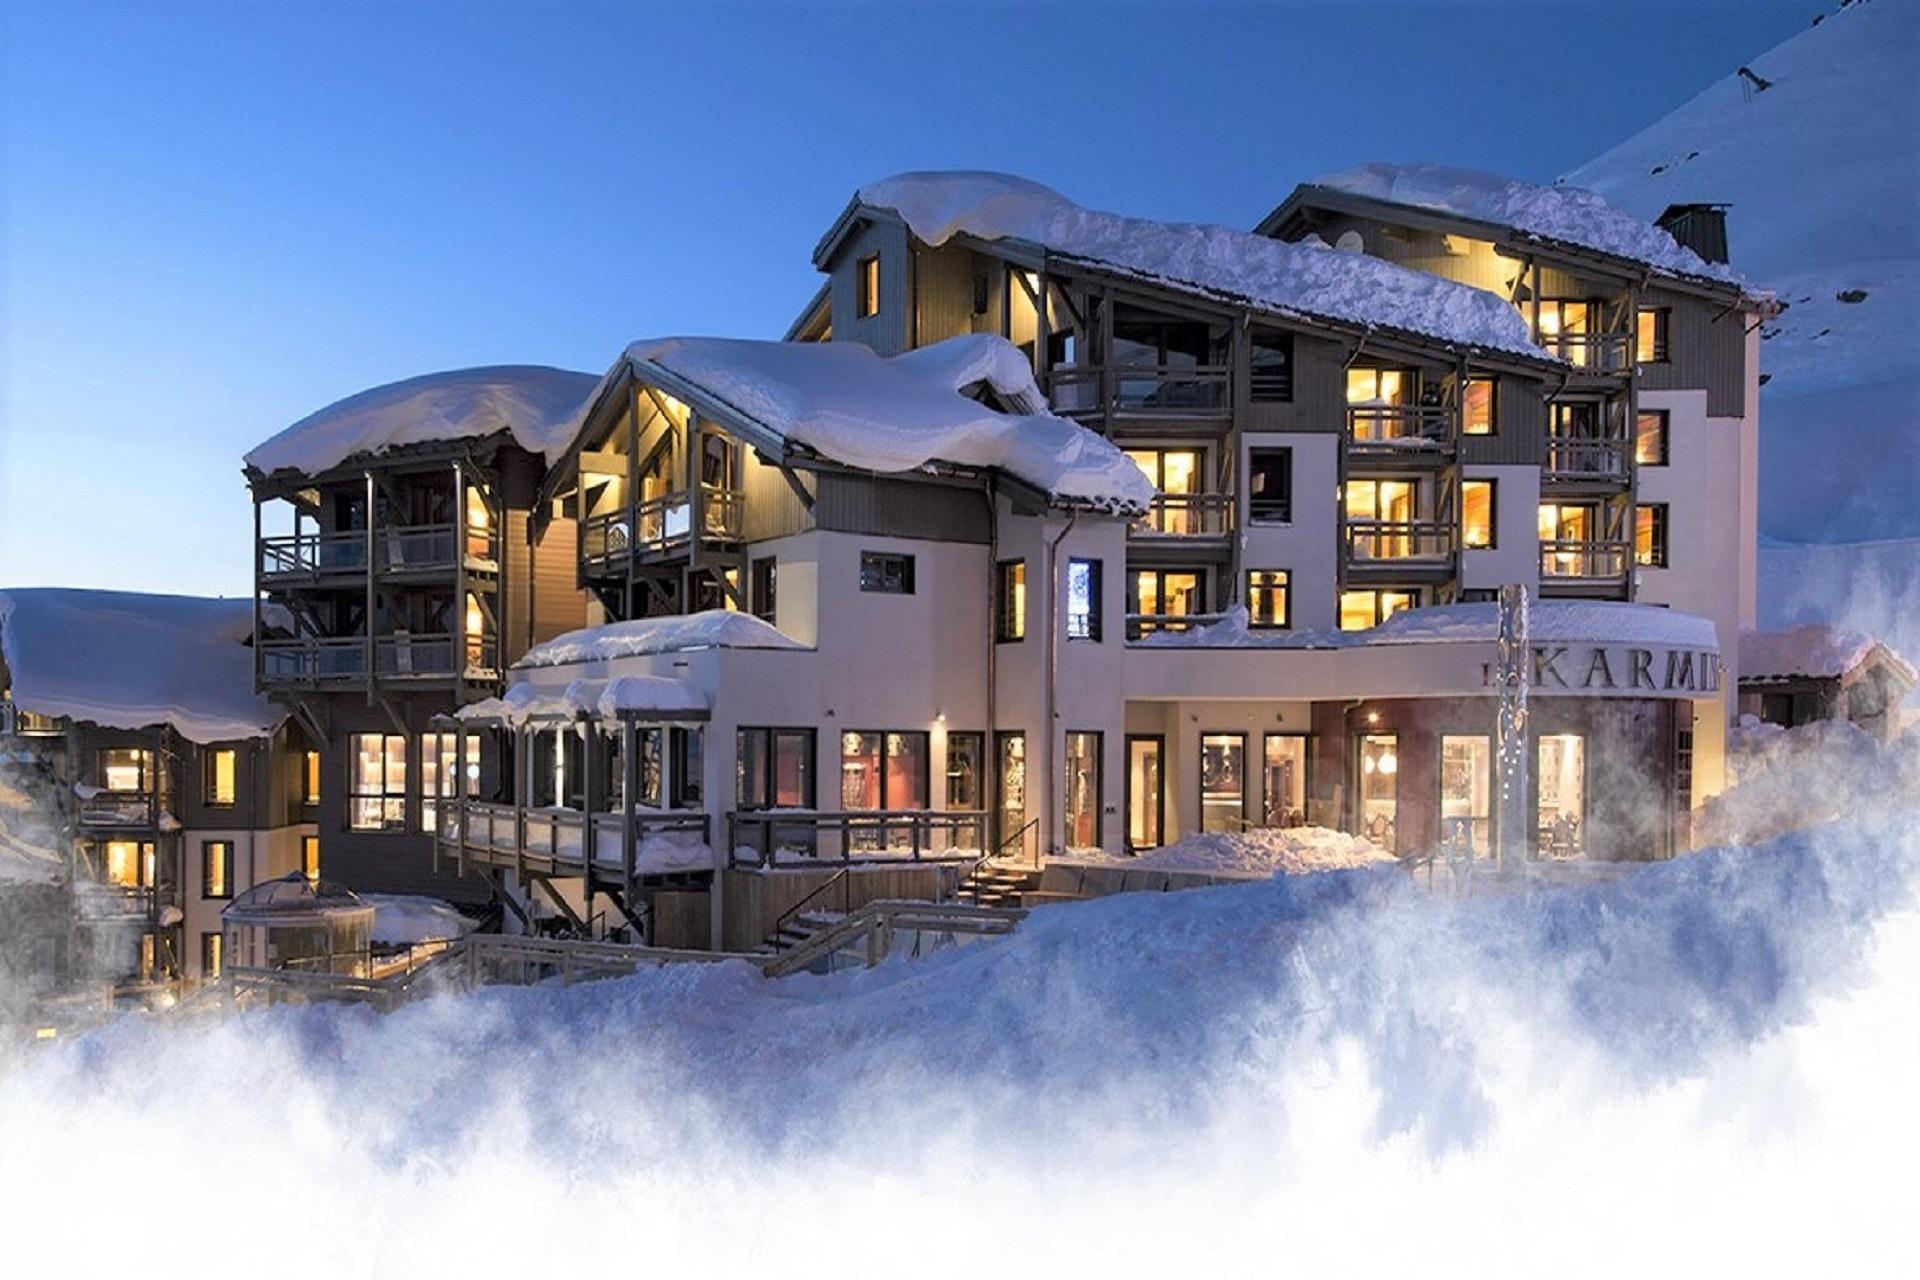 le-hameau-du-kashmir-val-thorens-montagnettes-ski-neige